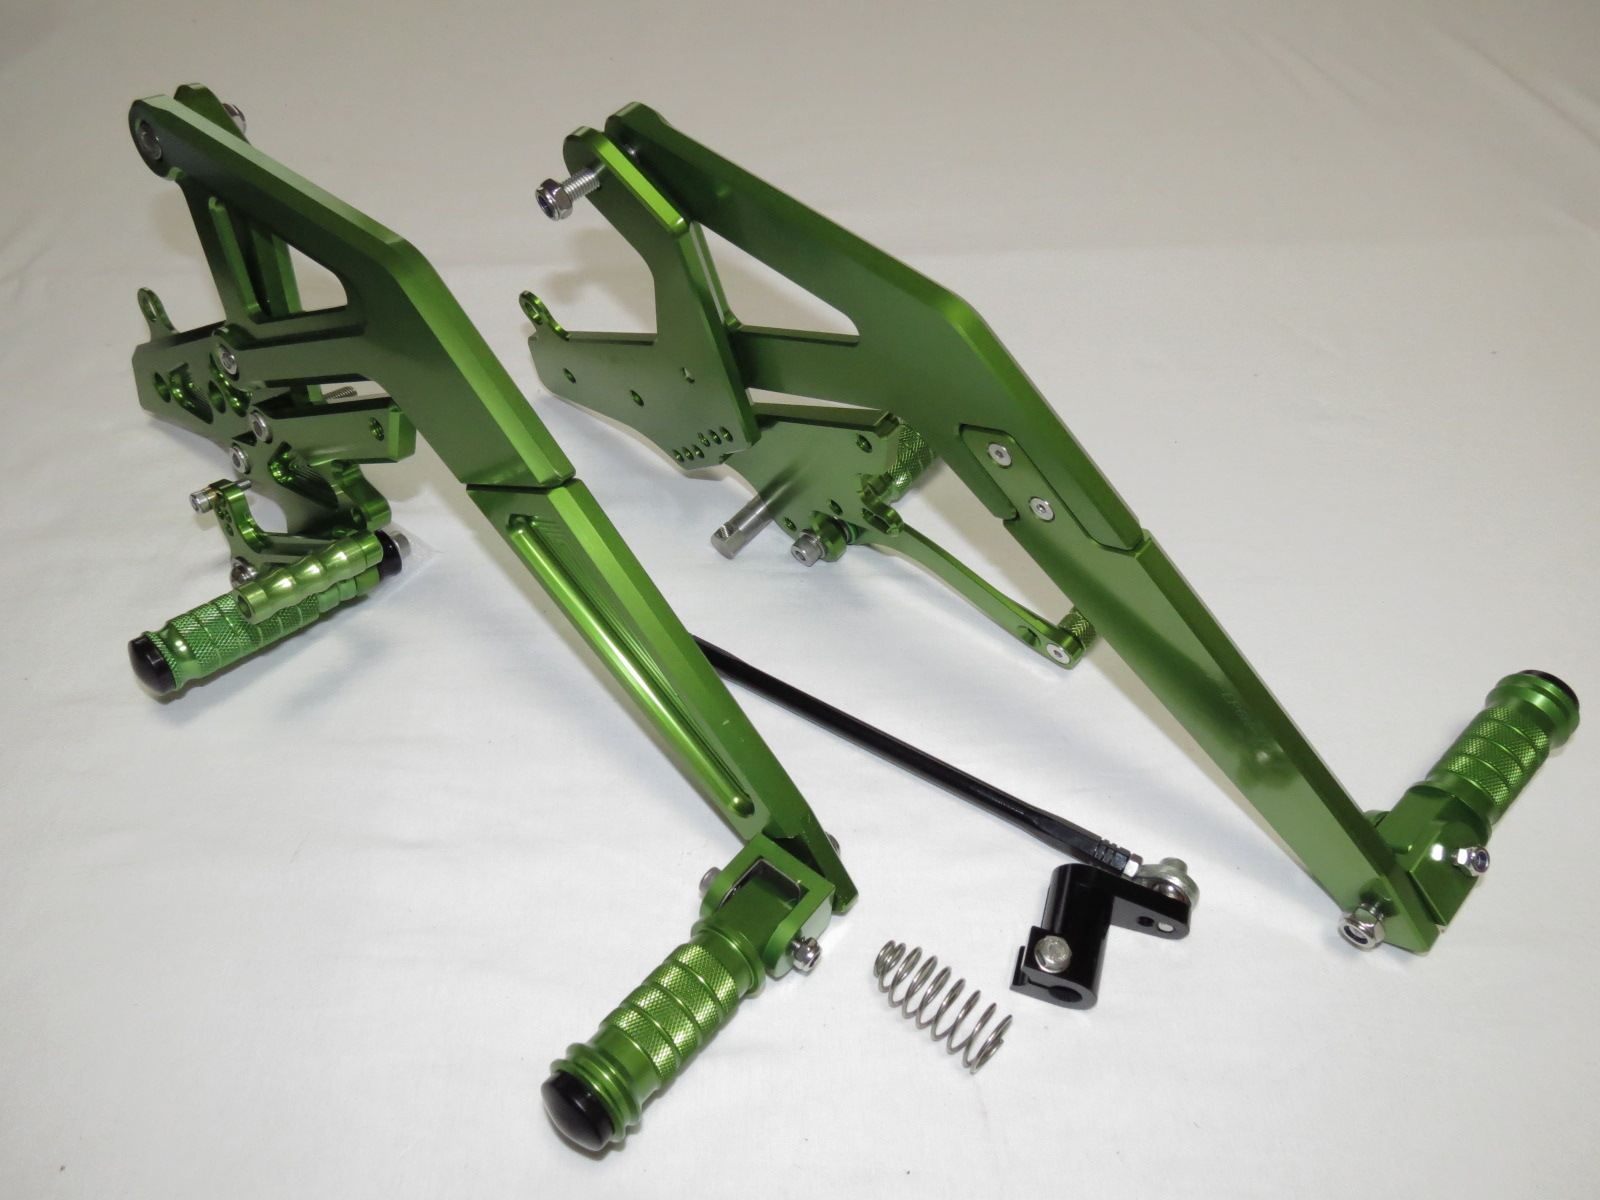 Ninja650 ER-6f/n 12-16、Ninja400 14-17 調整式バックステップセット CNCタンデム付 緑